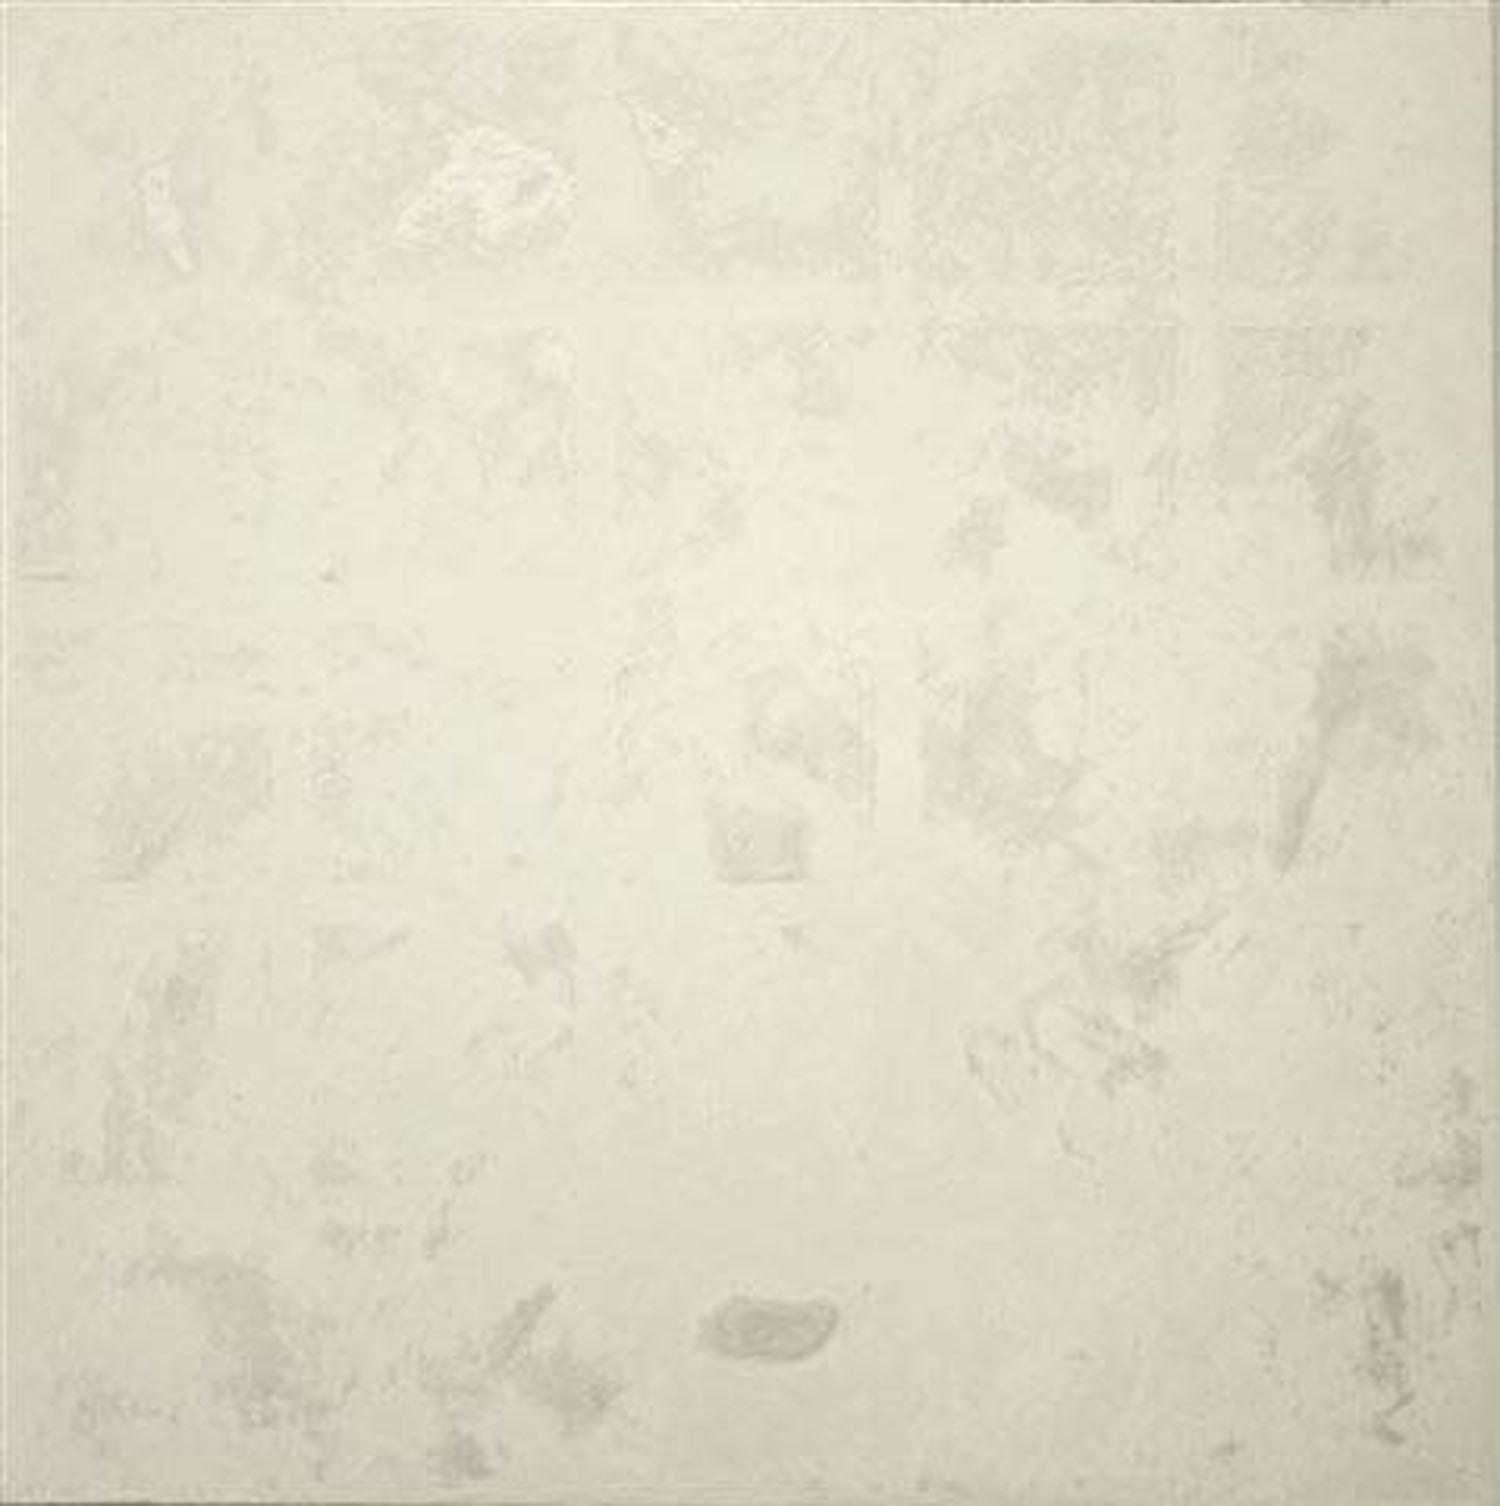 Makiko Nakamura_-_A Valentine-I_45 x 45cm.jpg